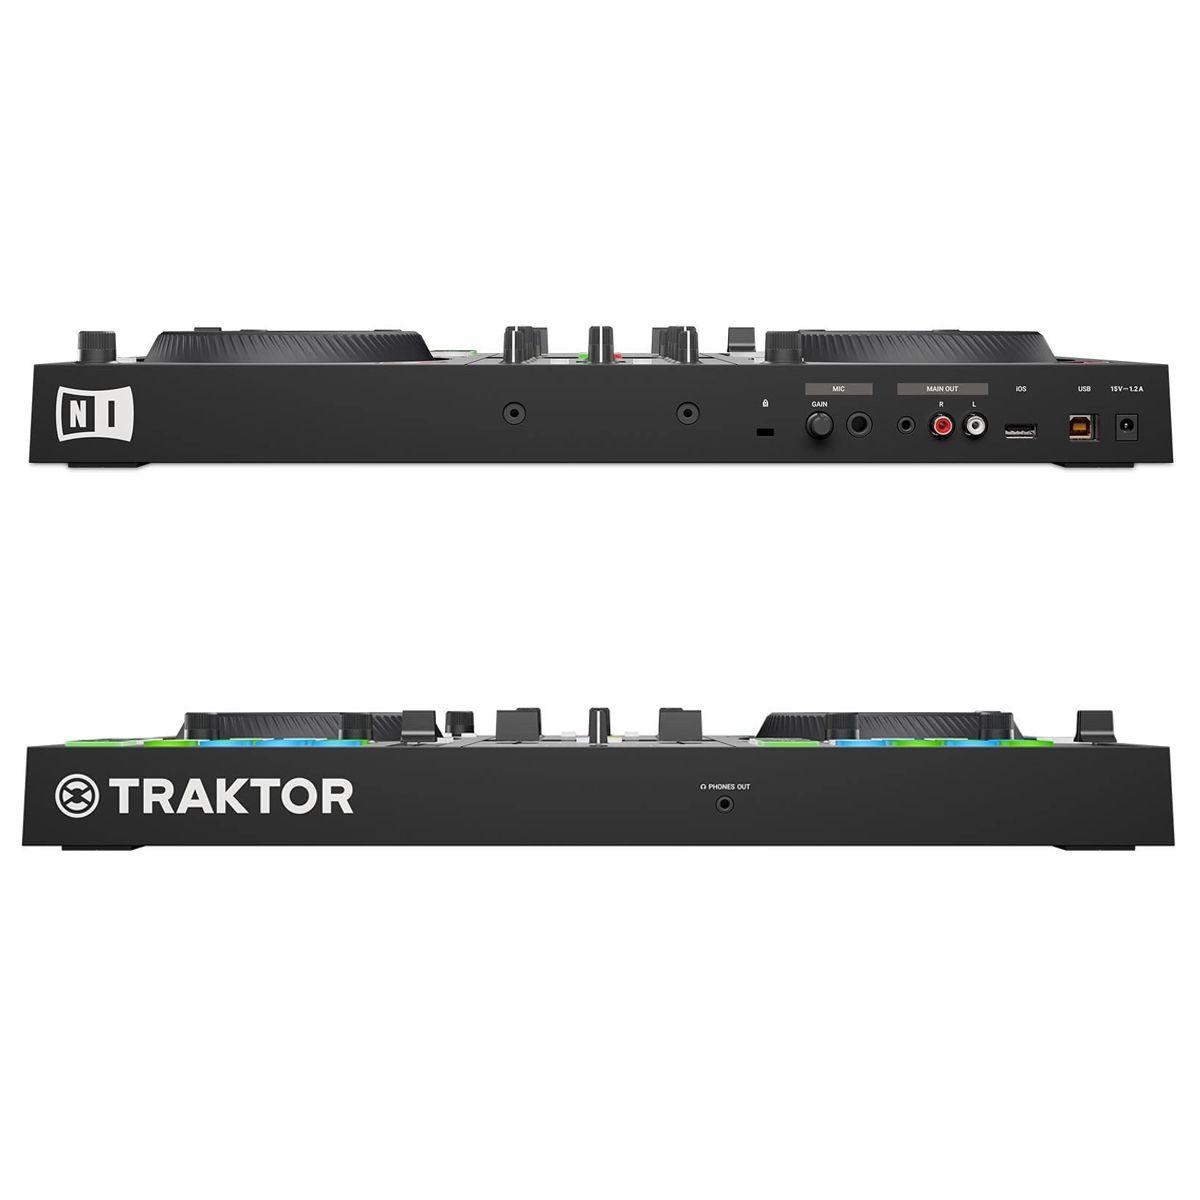 Controladora Native Instruments Traktor Kontrol S2 MK3 com bag UDG